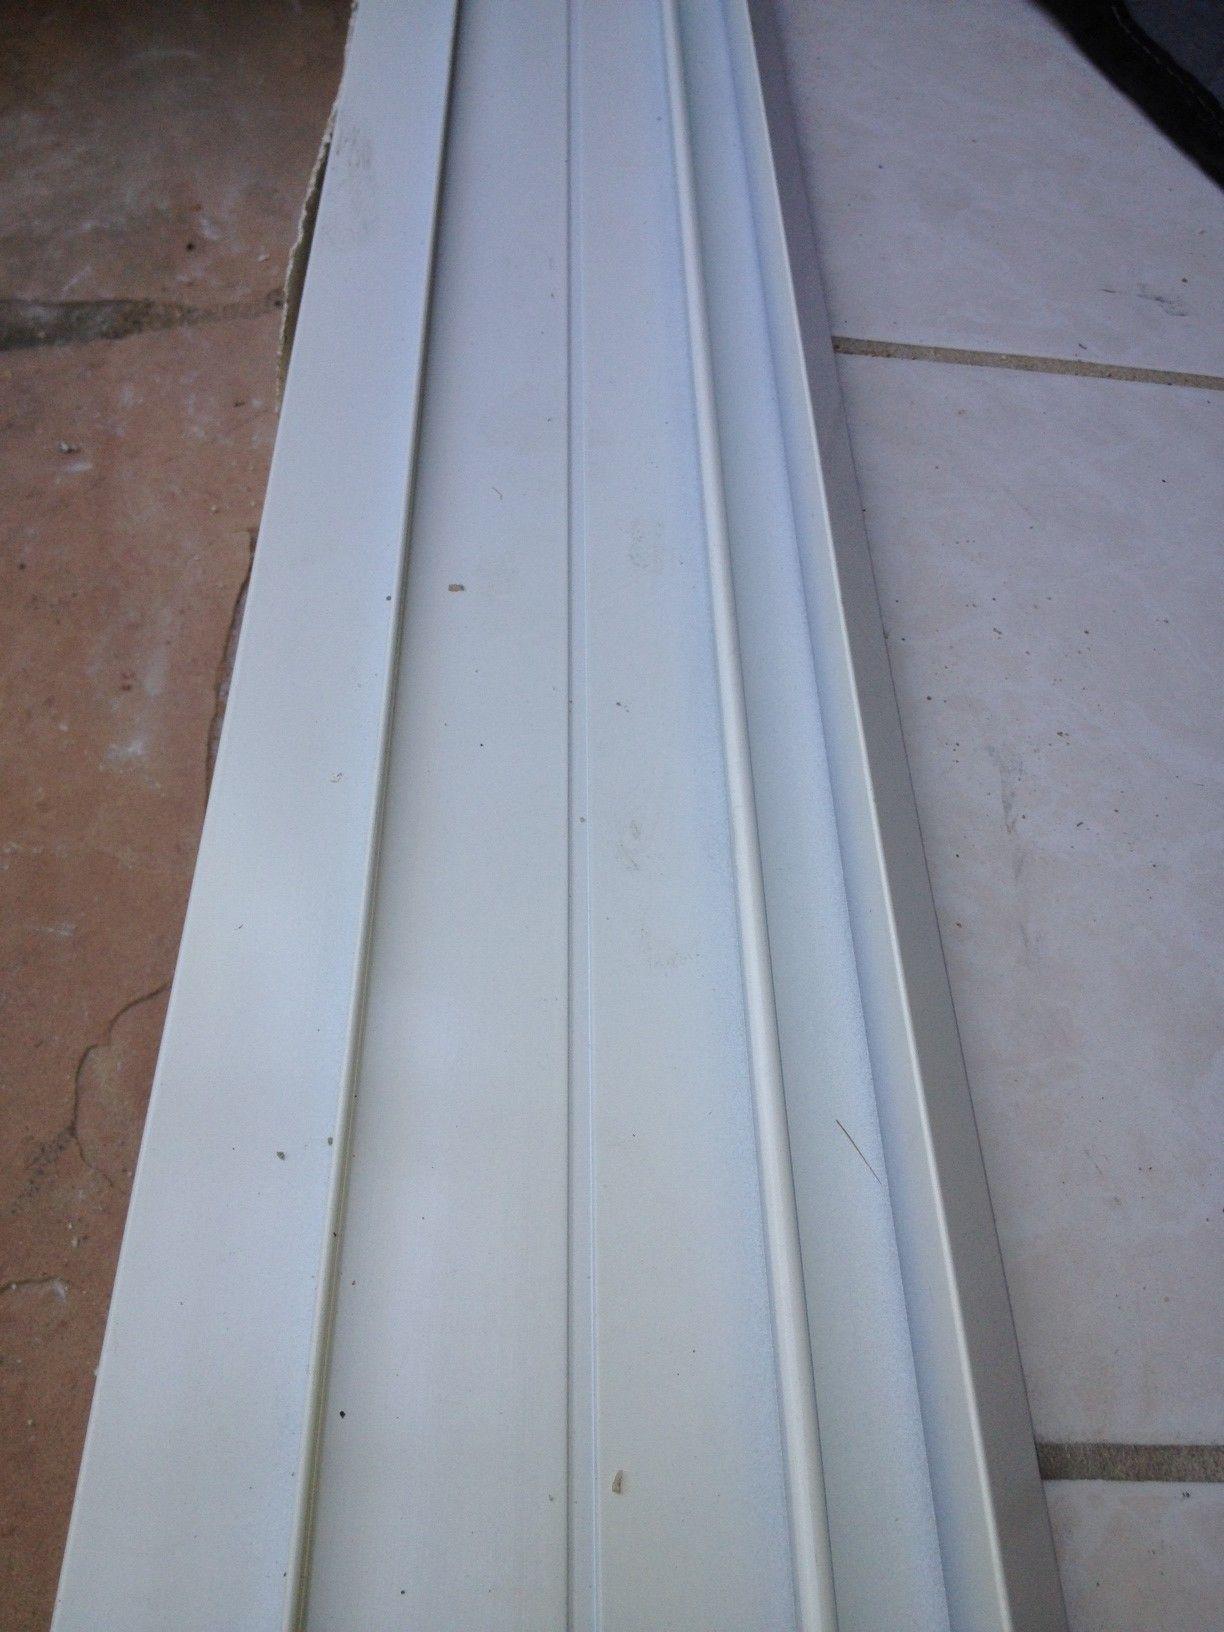 Sliding Door Track Repair San Diego   After 3